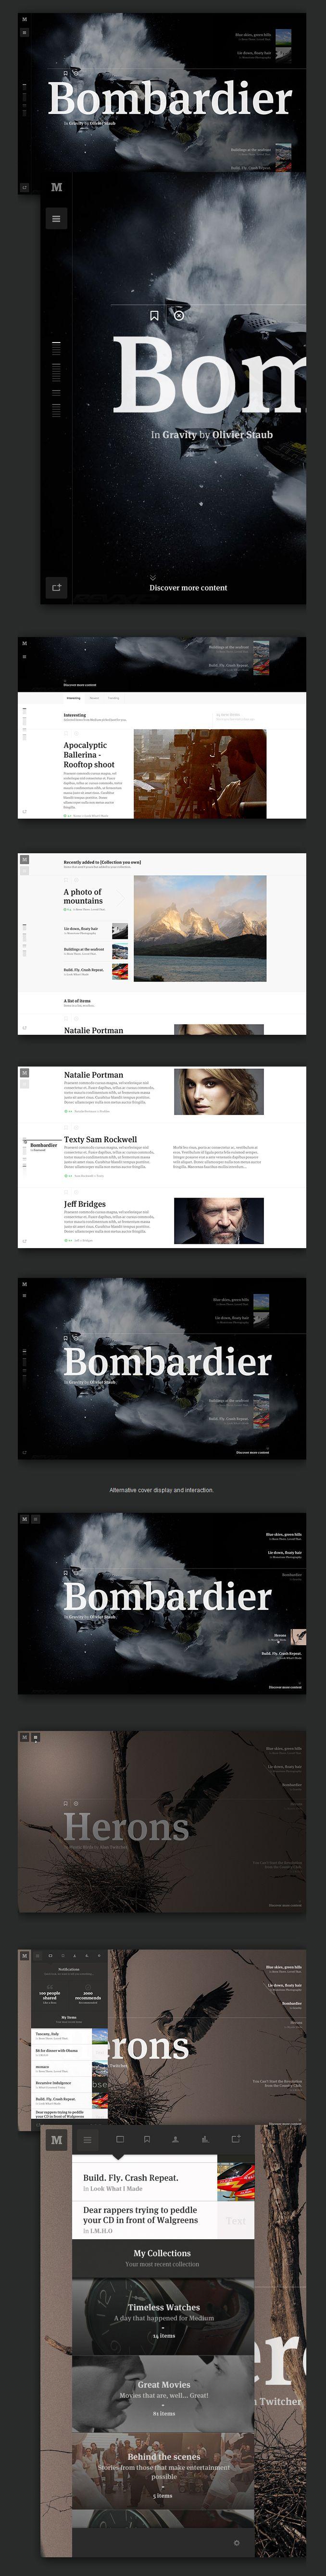 #typography #spacing #minimalism